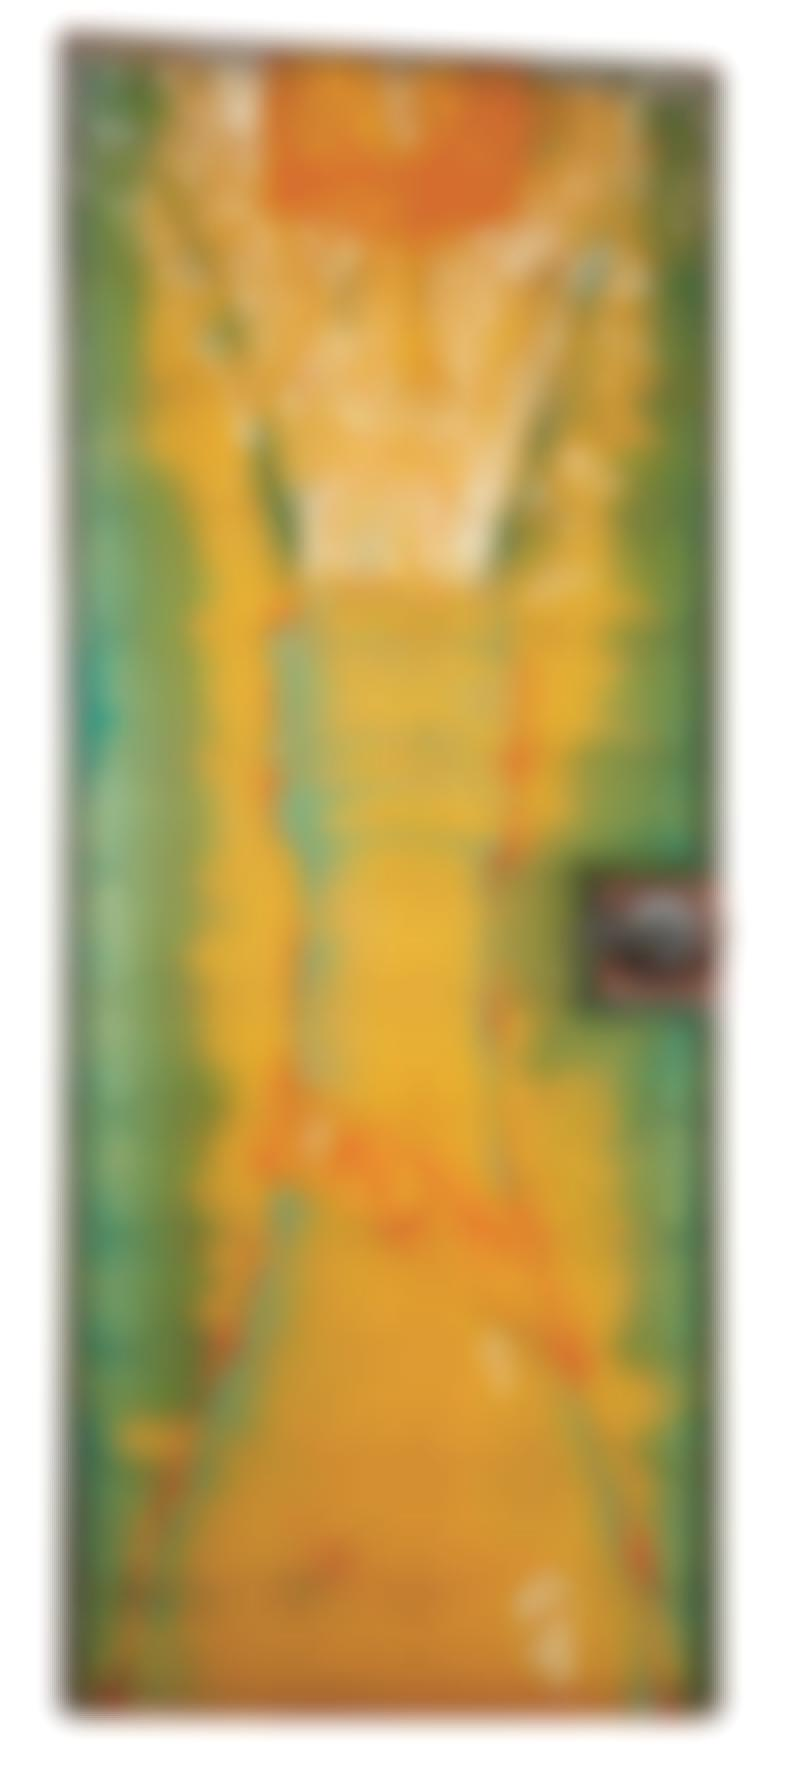 Gaetano Pesce - Door-1991